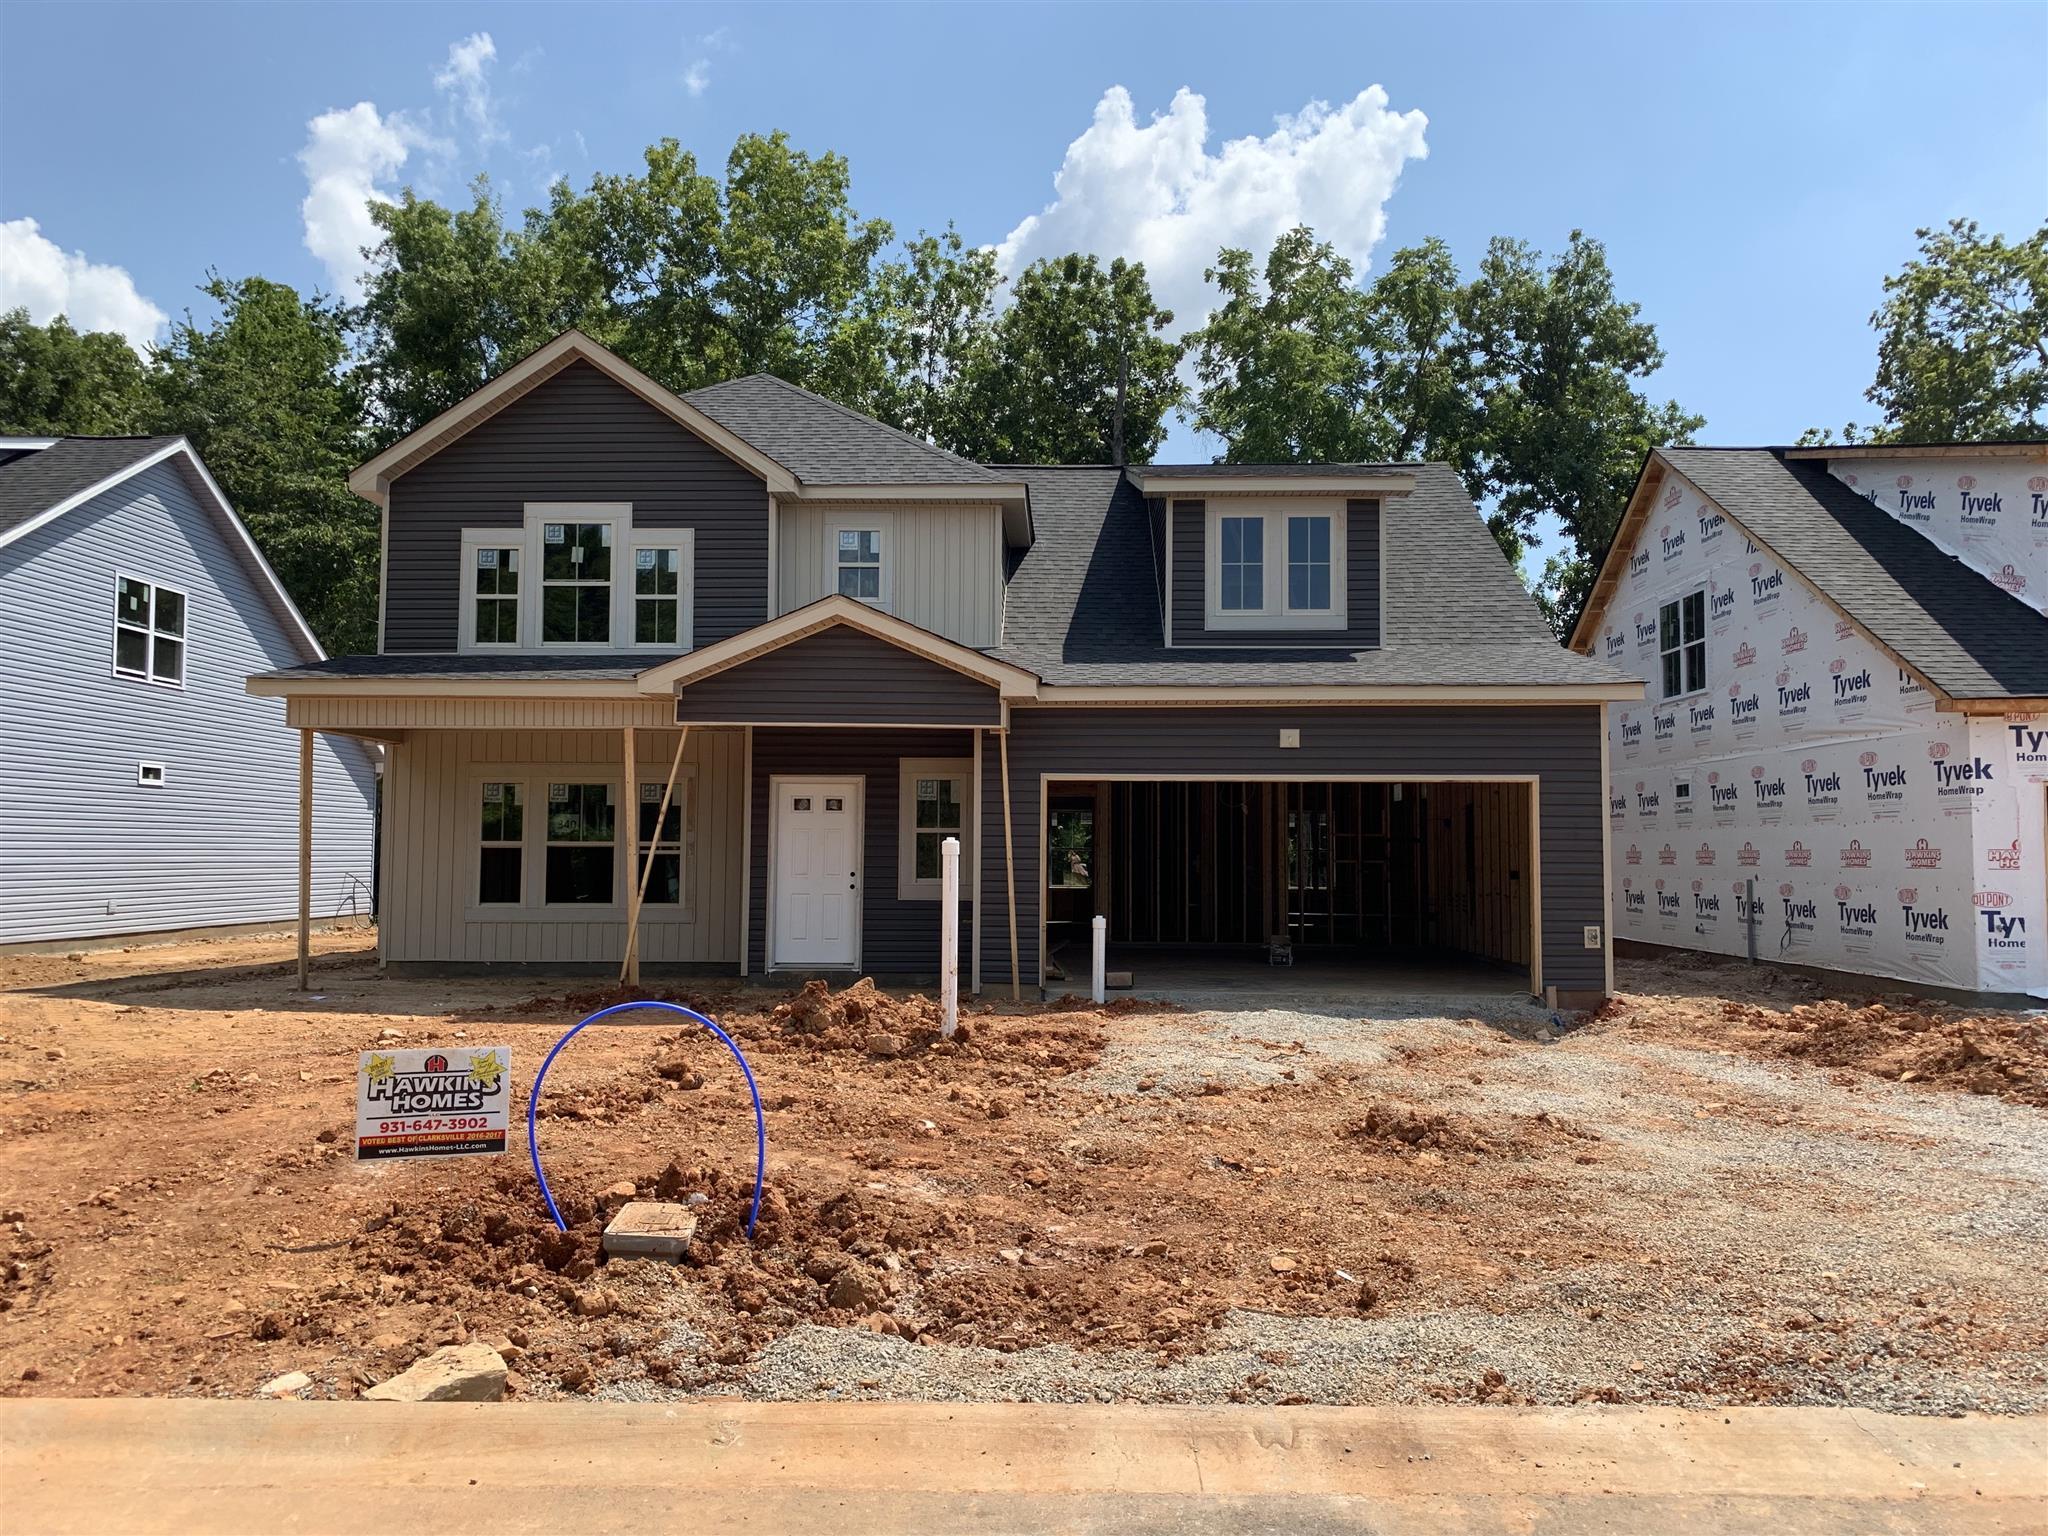 340 Eagles Bluff, Clarksville, TN 37040 - Clarksville, TN real estate listing